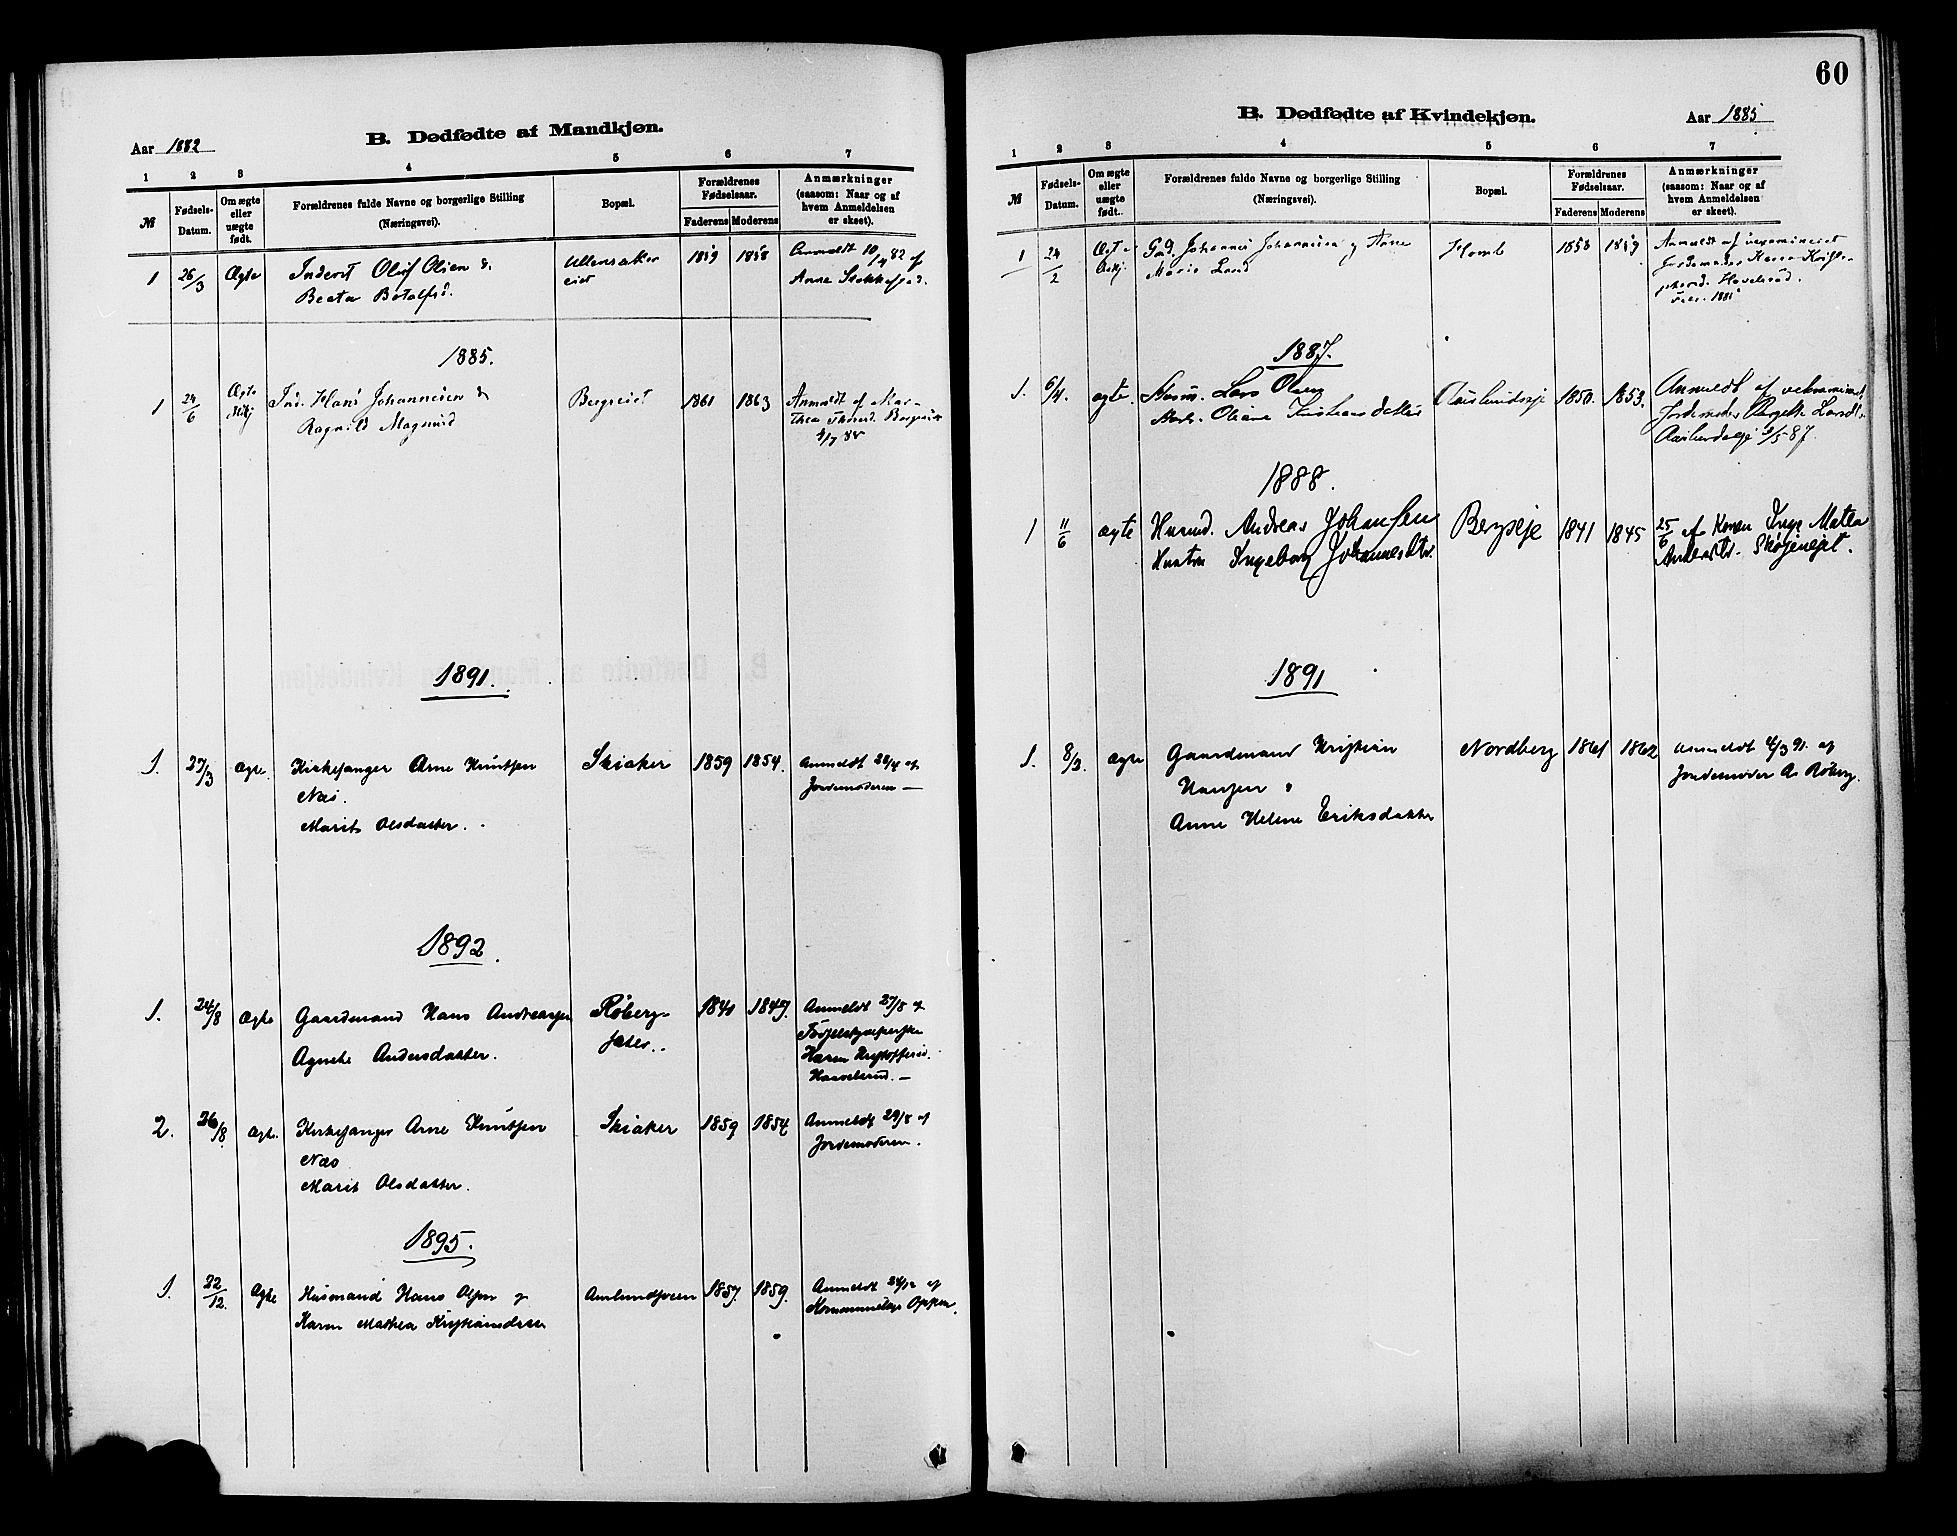 SAH, Nordre Land prestekontor, Ministerialbok nr. 3, 1882-1896, s. 60